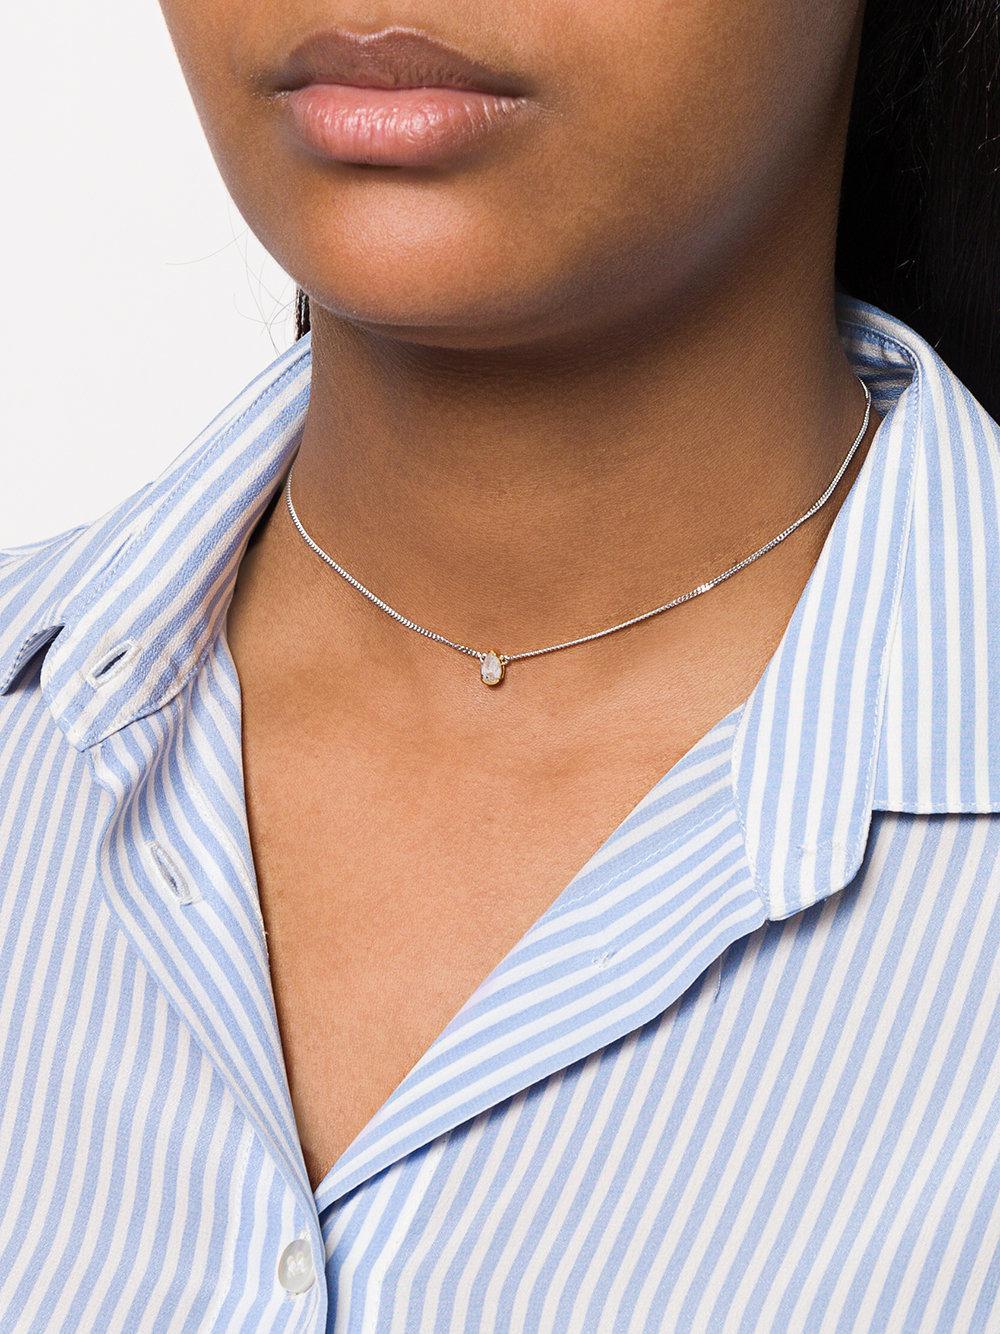 V JEWELLERY Evelyn necklace - Metallic kgn8RRr